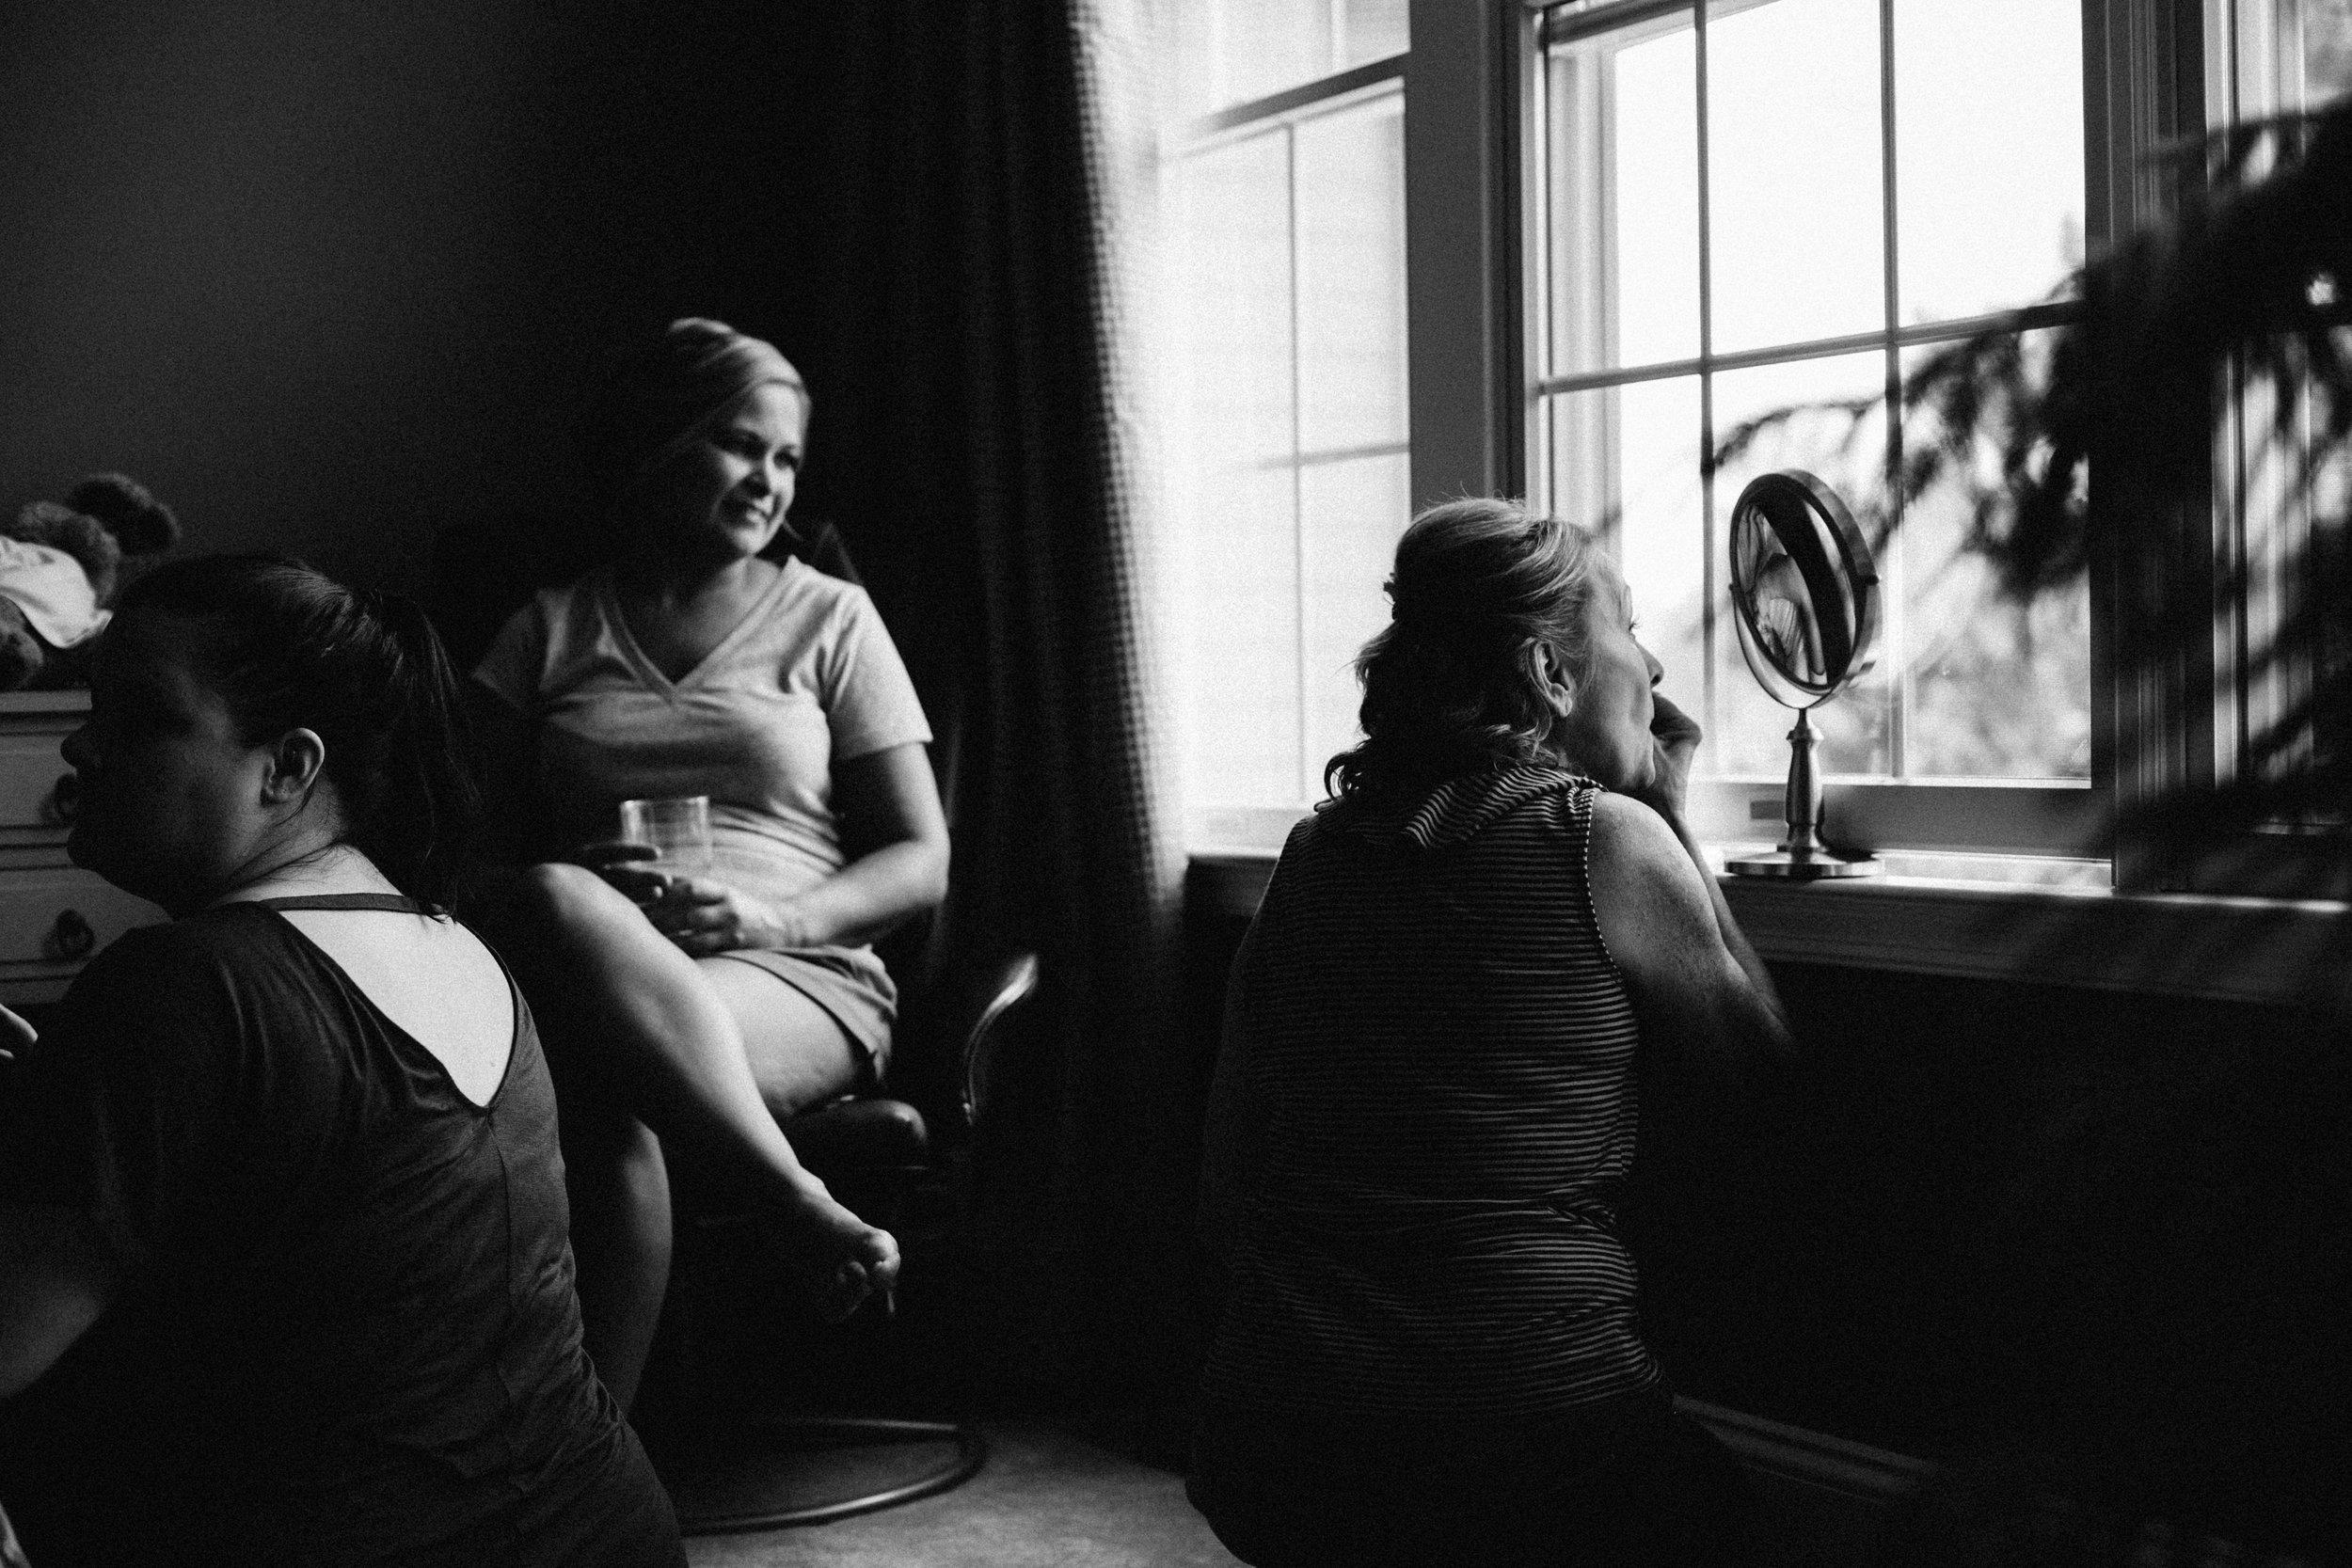 JodyCJ_LaurenCrawford Photography-52.jpg